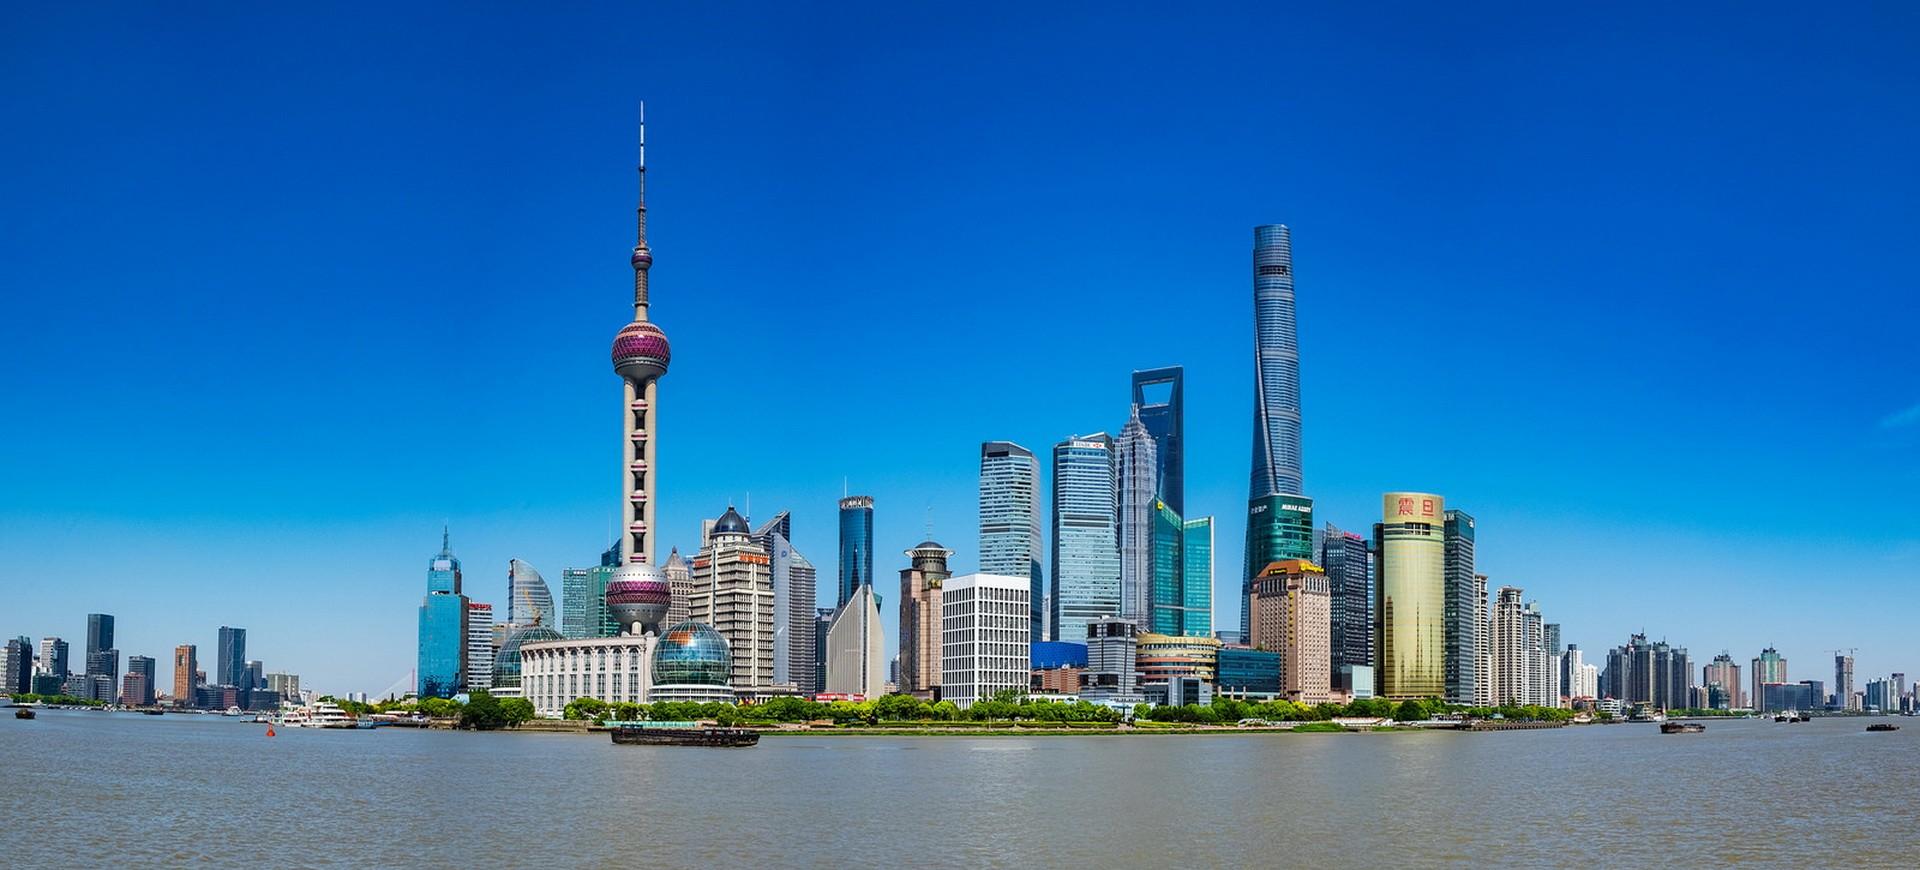 Skyline de Shanghai vu depuis le Bund